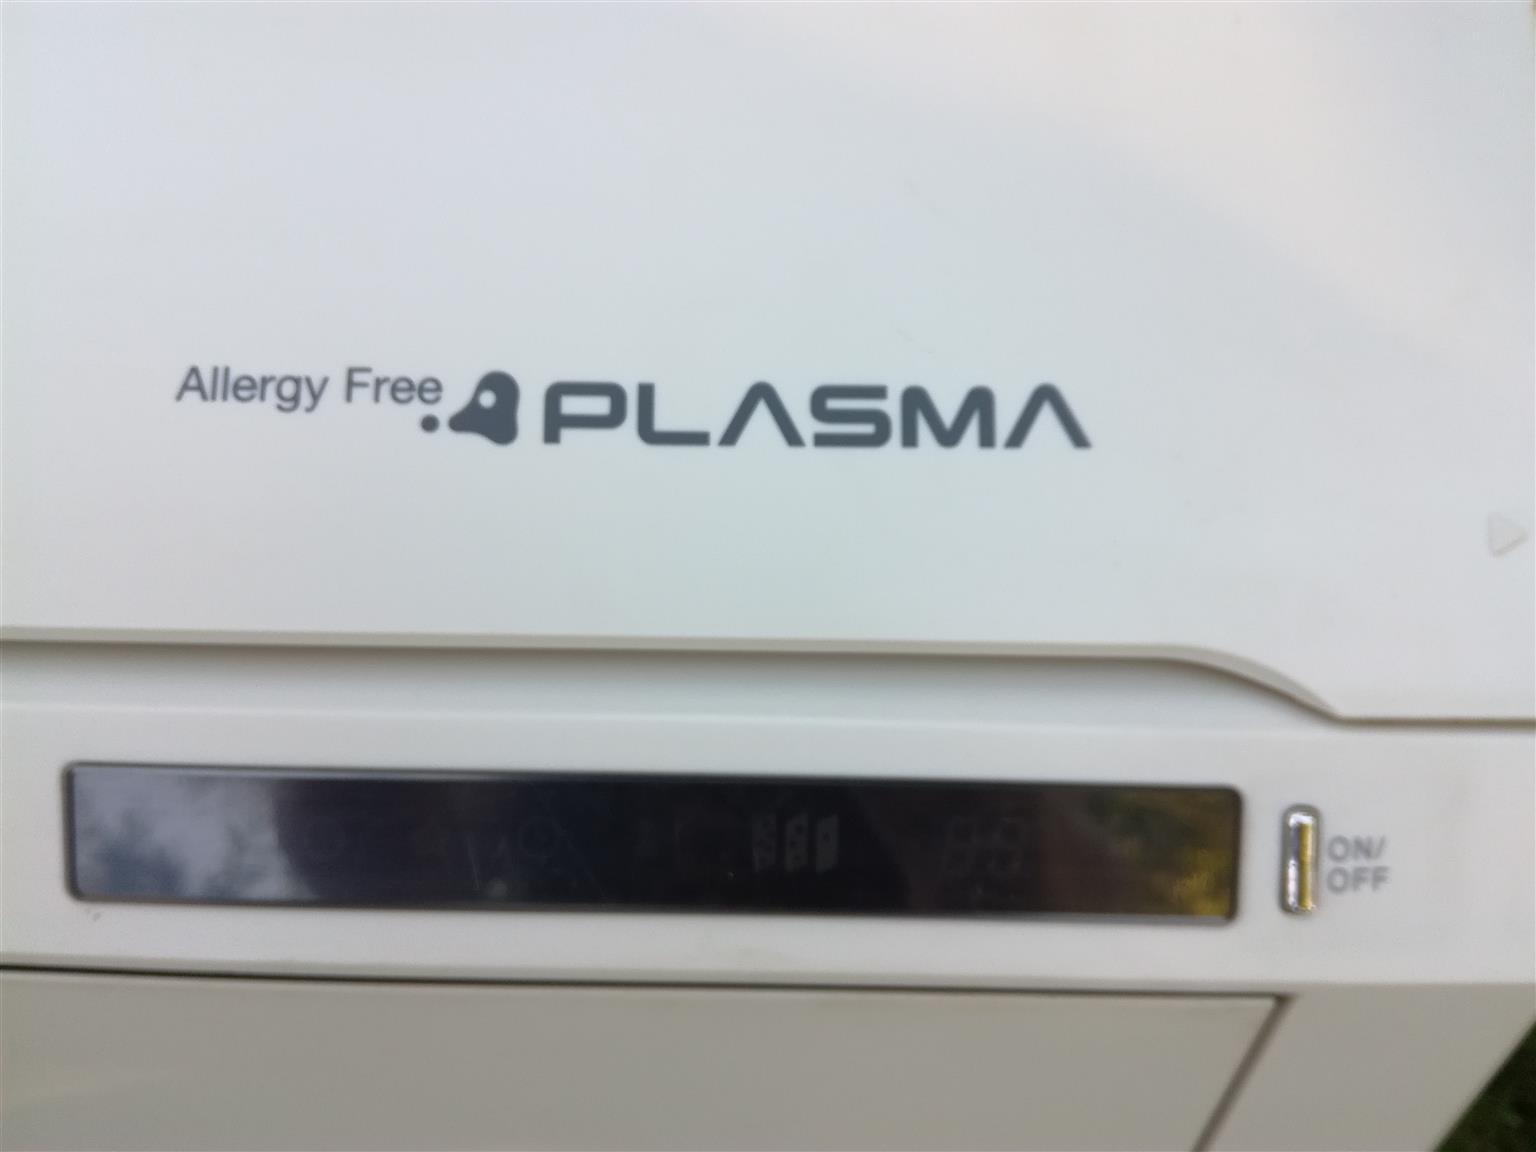 LG Allergy Free Plasma